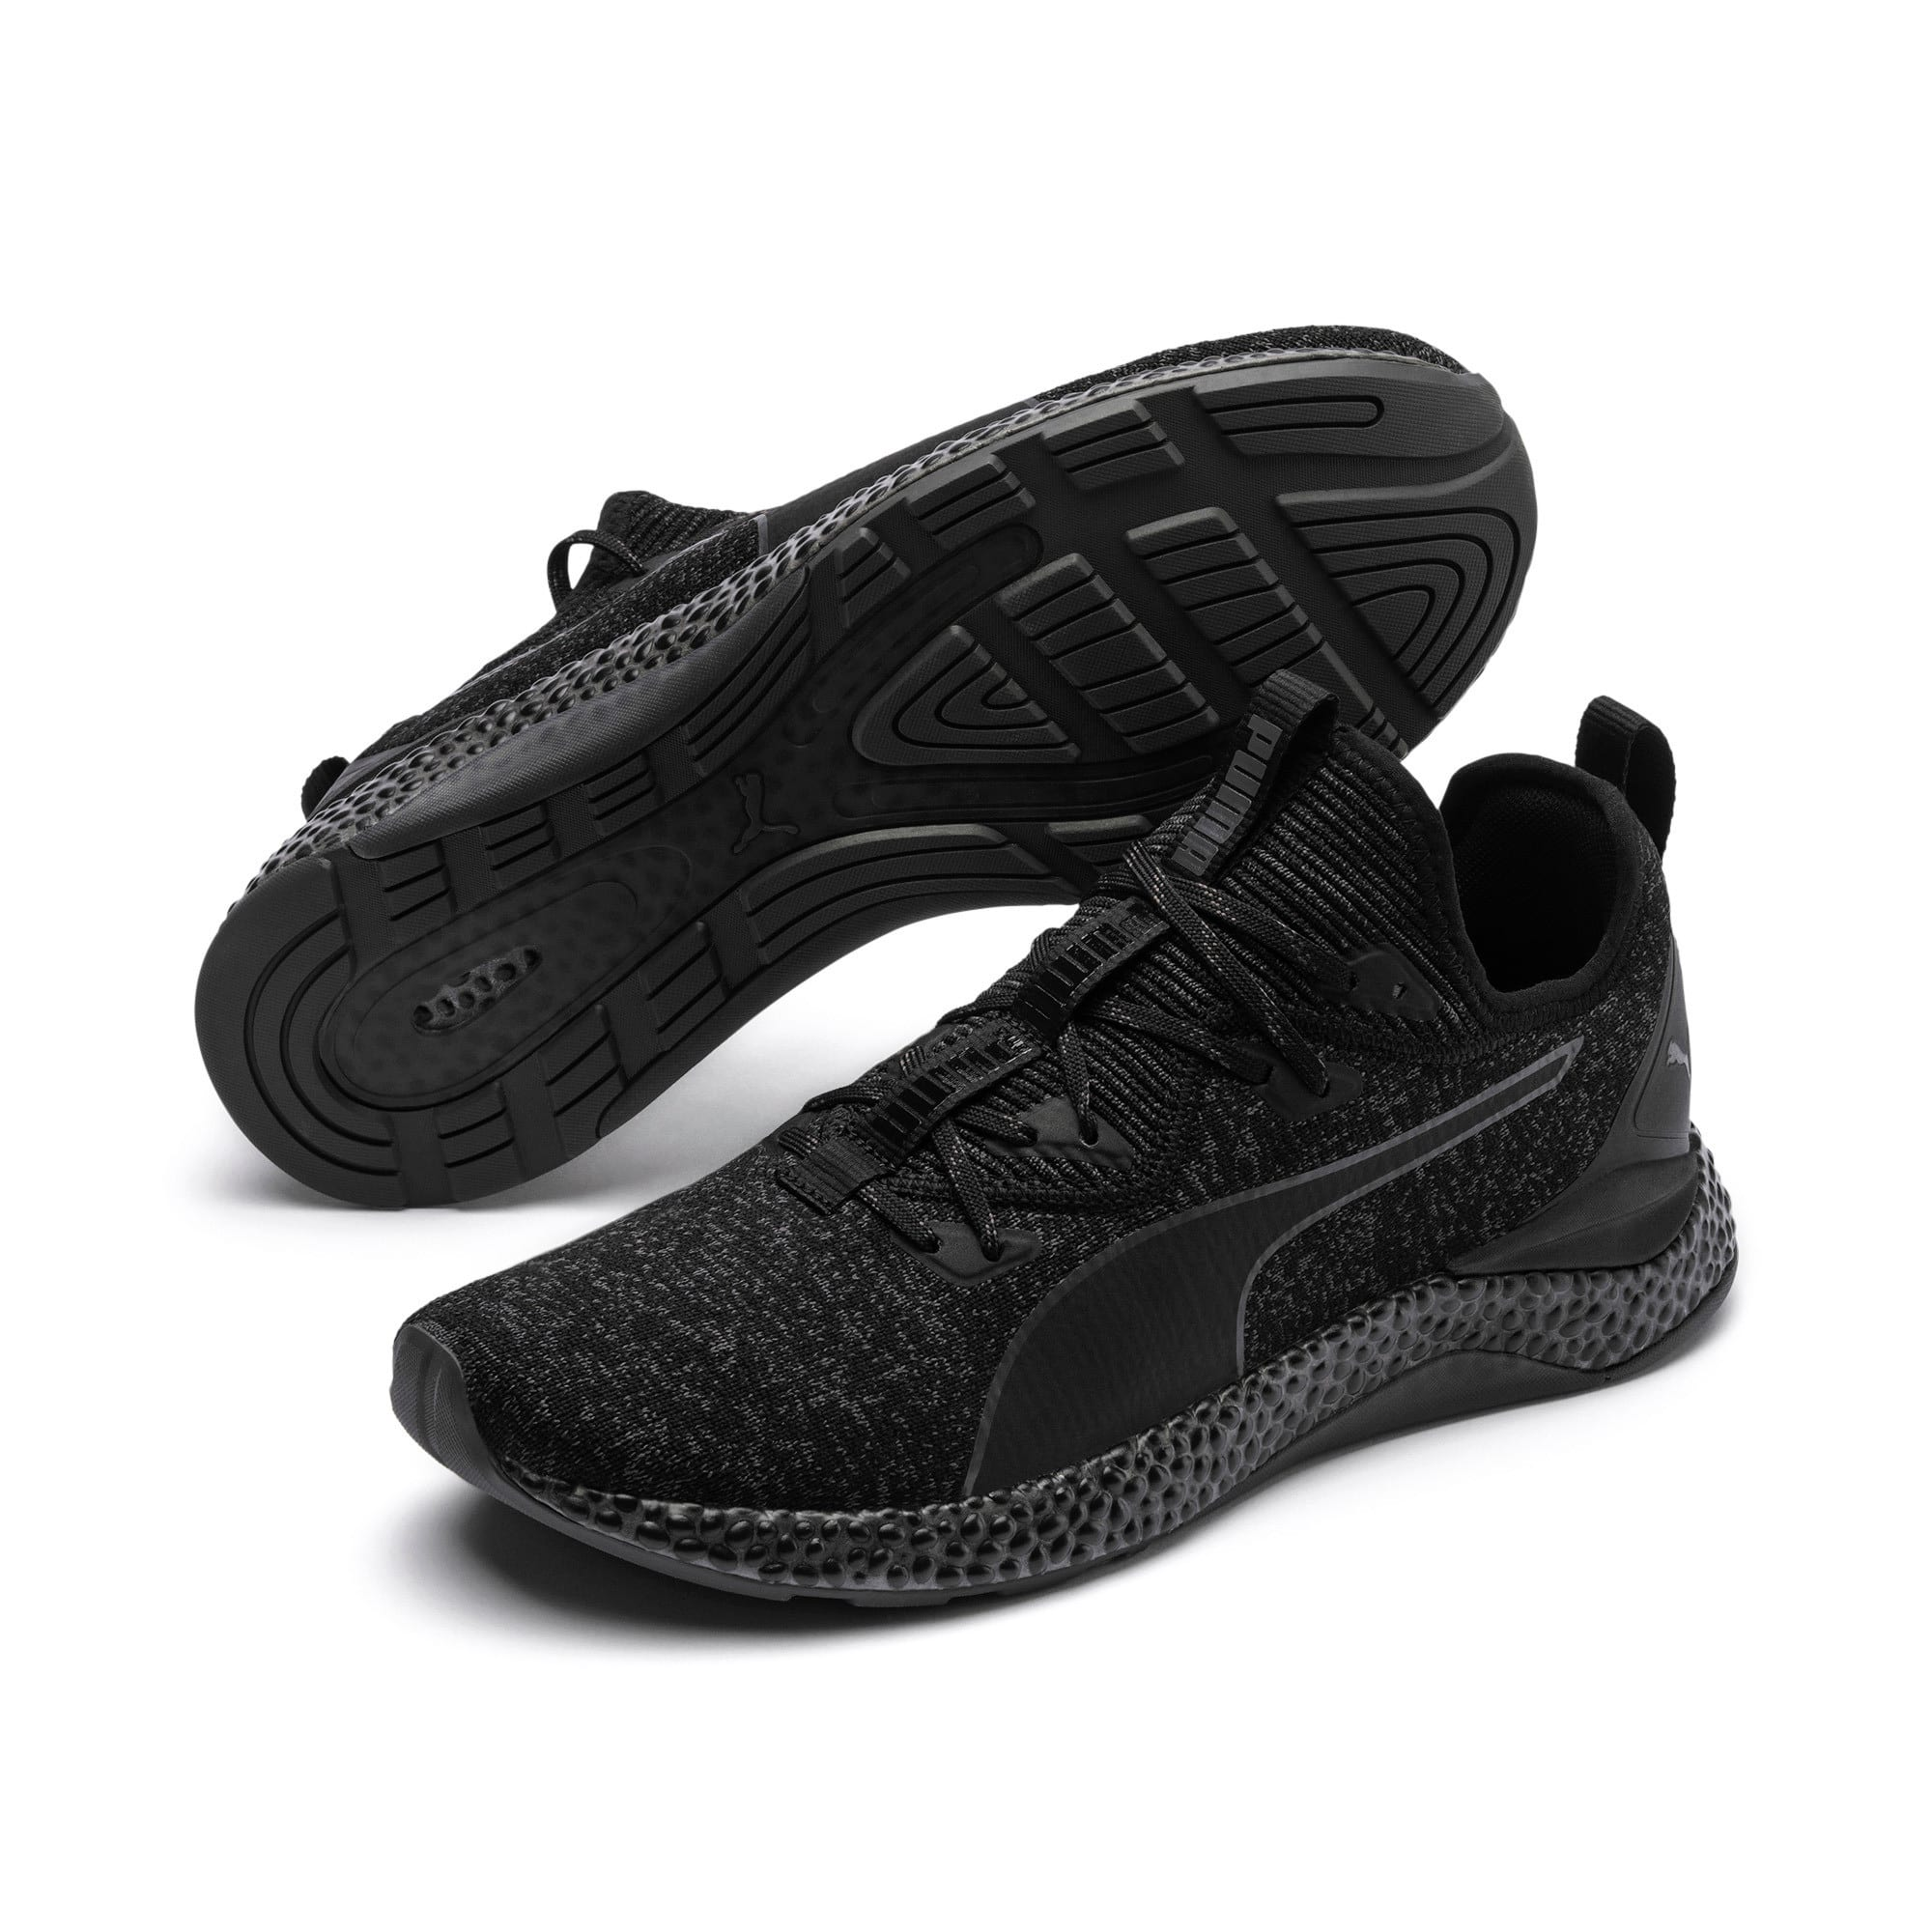 Thumbnail 3 of Hybrid Runner hardloopschoenen voor heren, Asphalt-Puma Black, medium